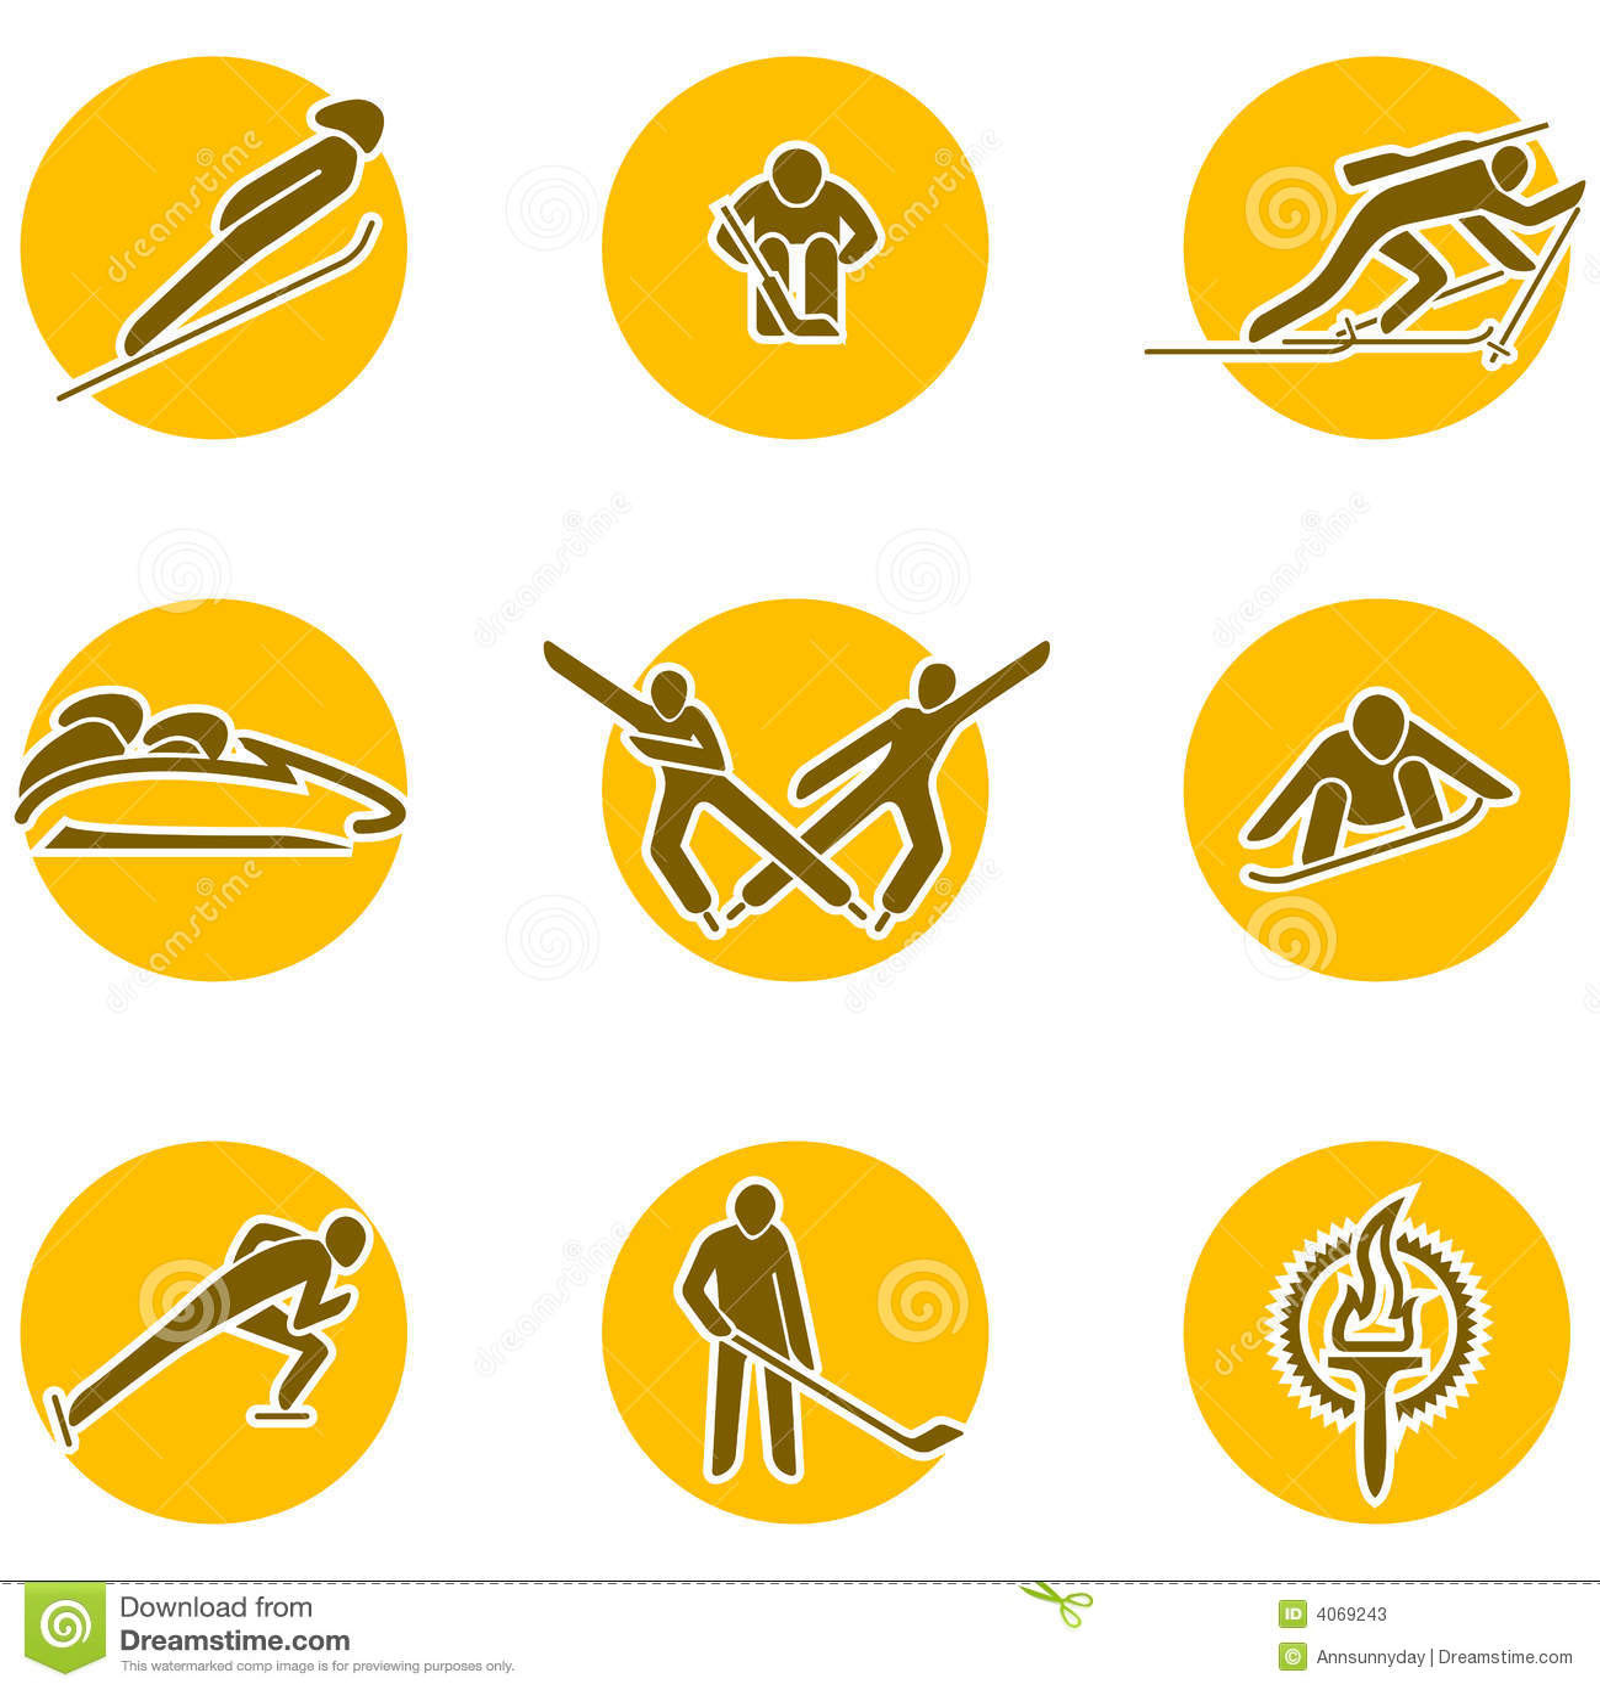 Winter sports icon set